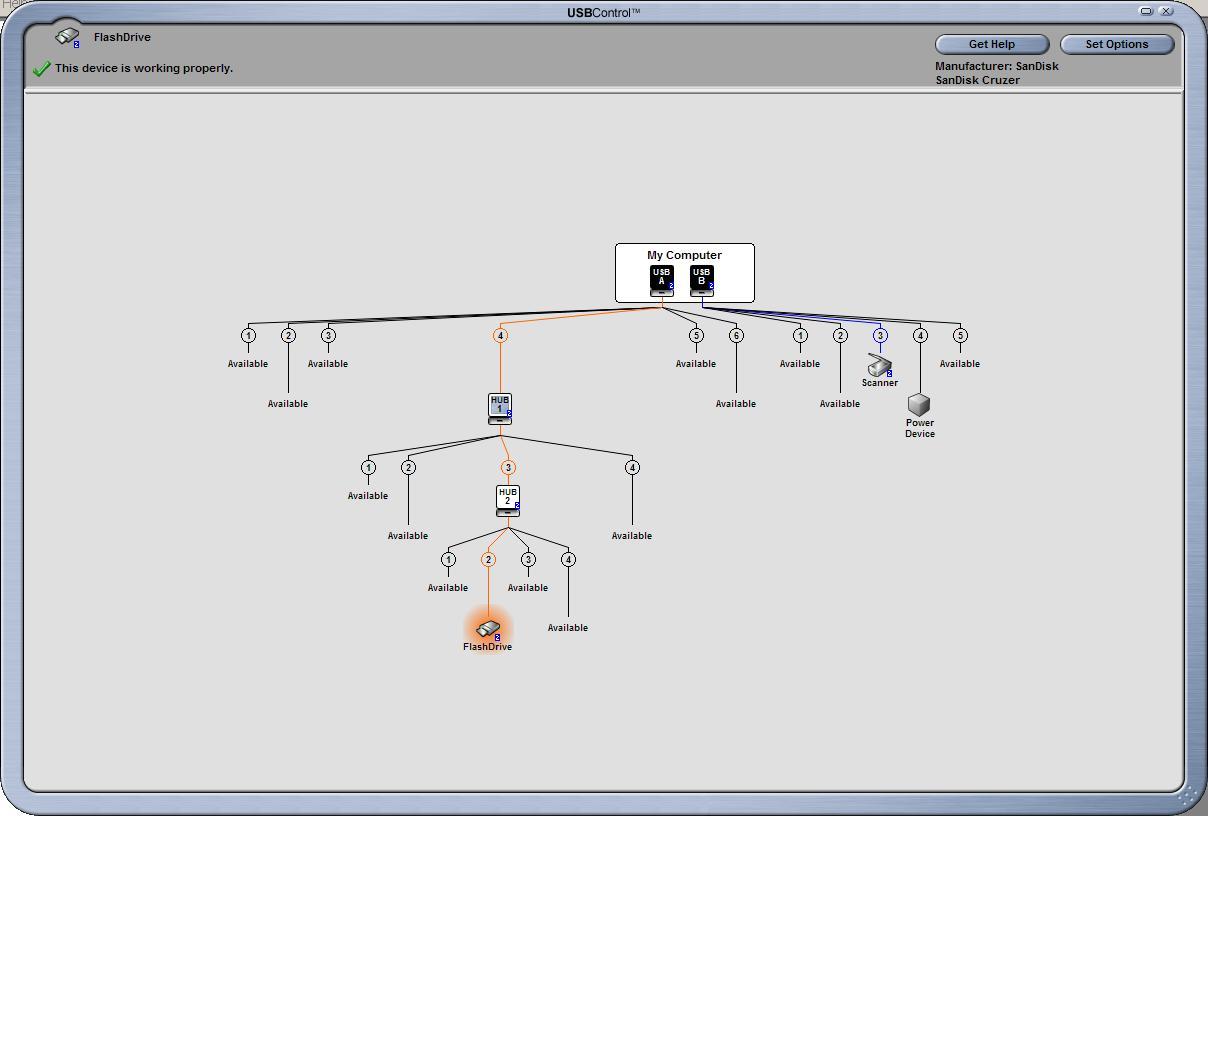 USBControl2.JPG